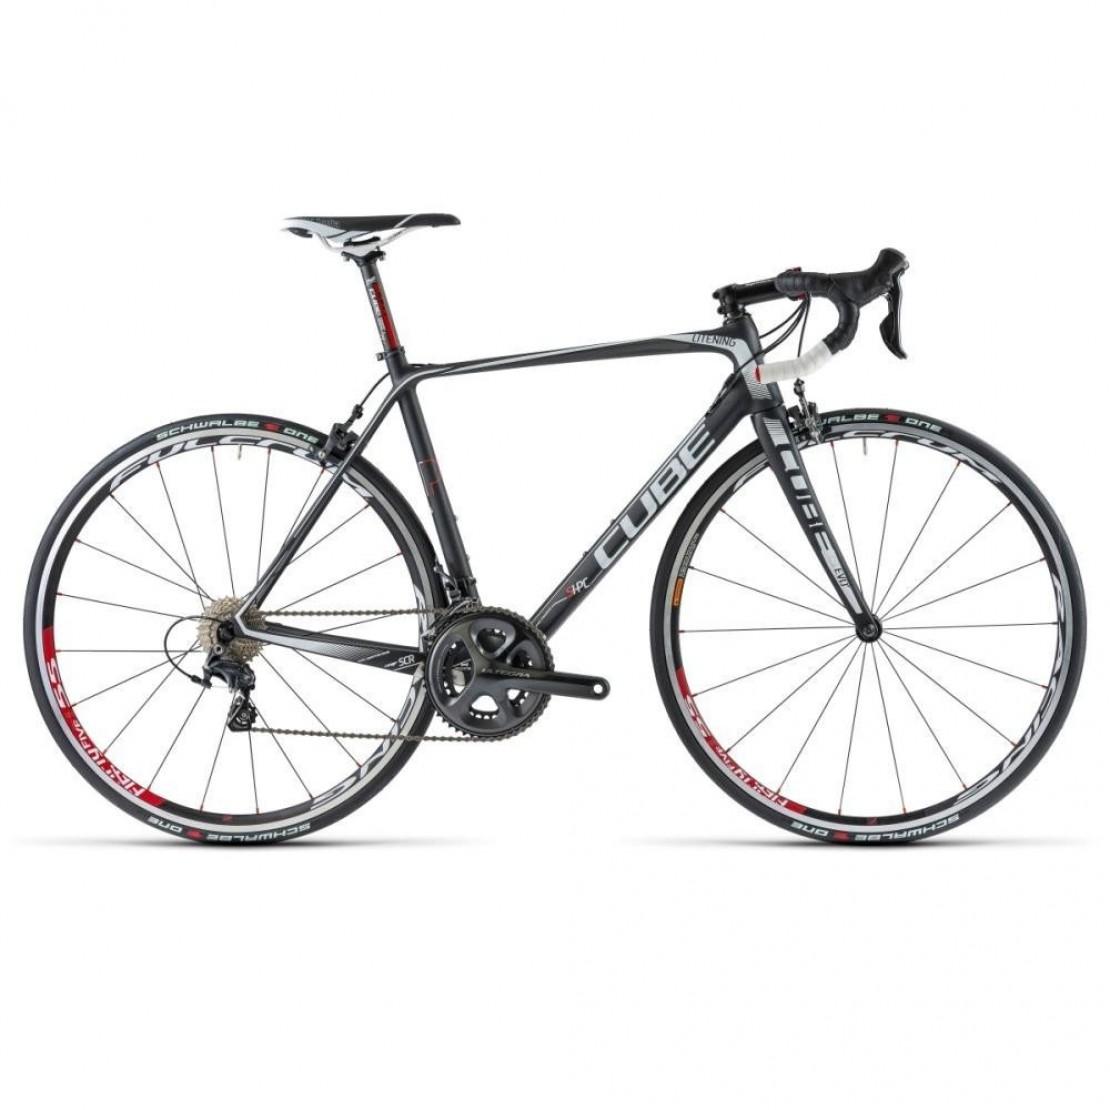 Cube Litening Super HPC Pro Blackline 2014 Road Bike